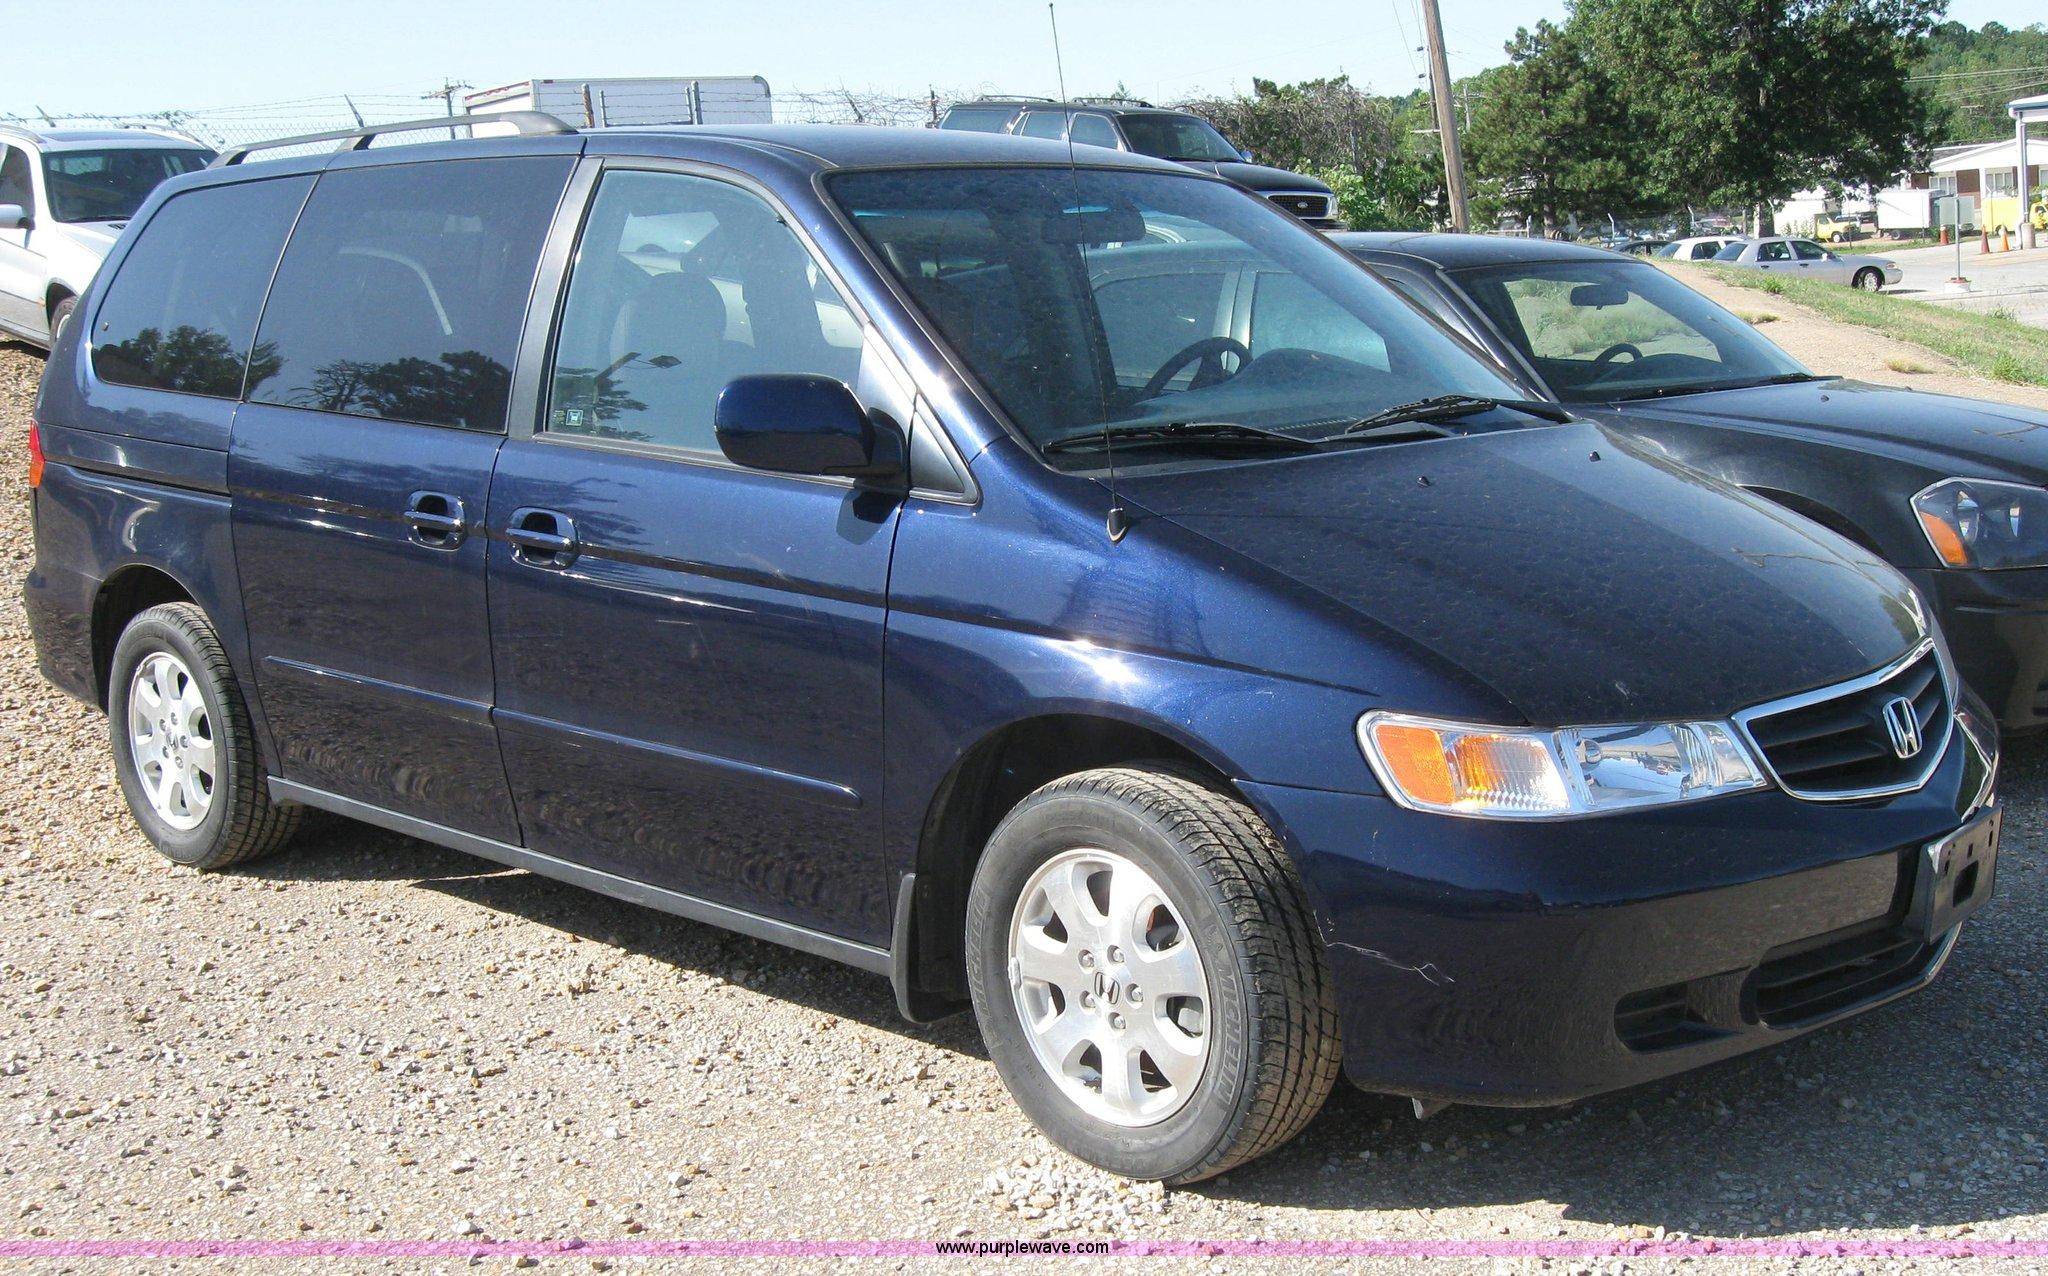 2003 Honda Odyssey Parts Tcc Wiring Diagram Ex Non Repairable Certificate 2048x1276